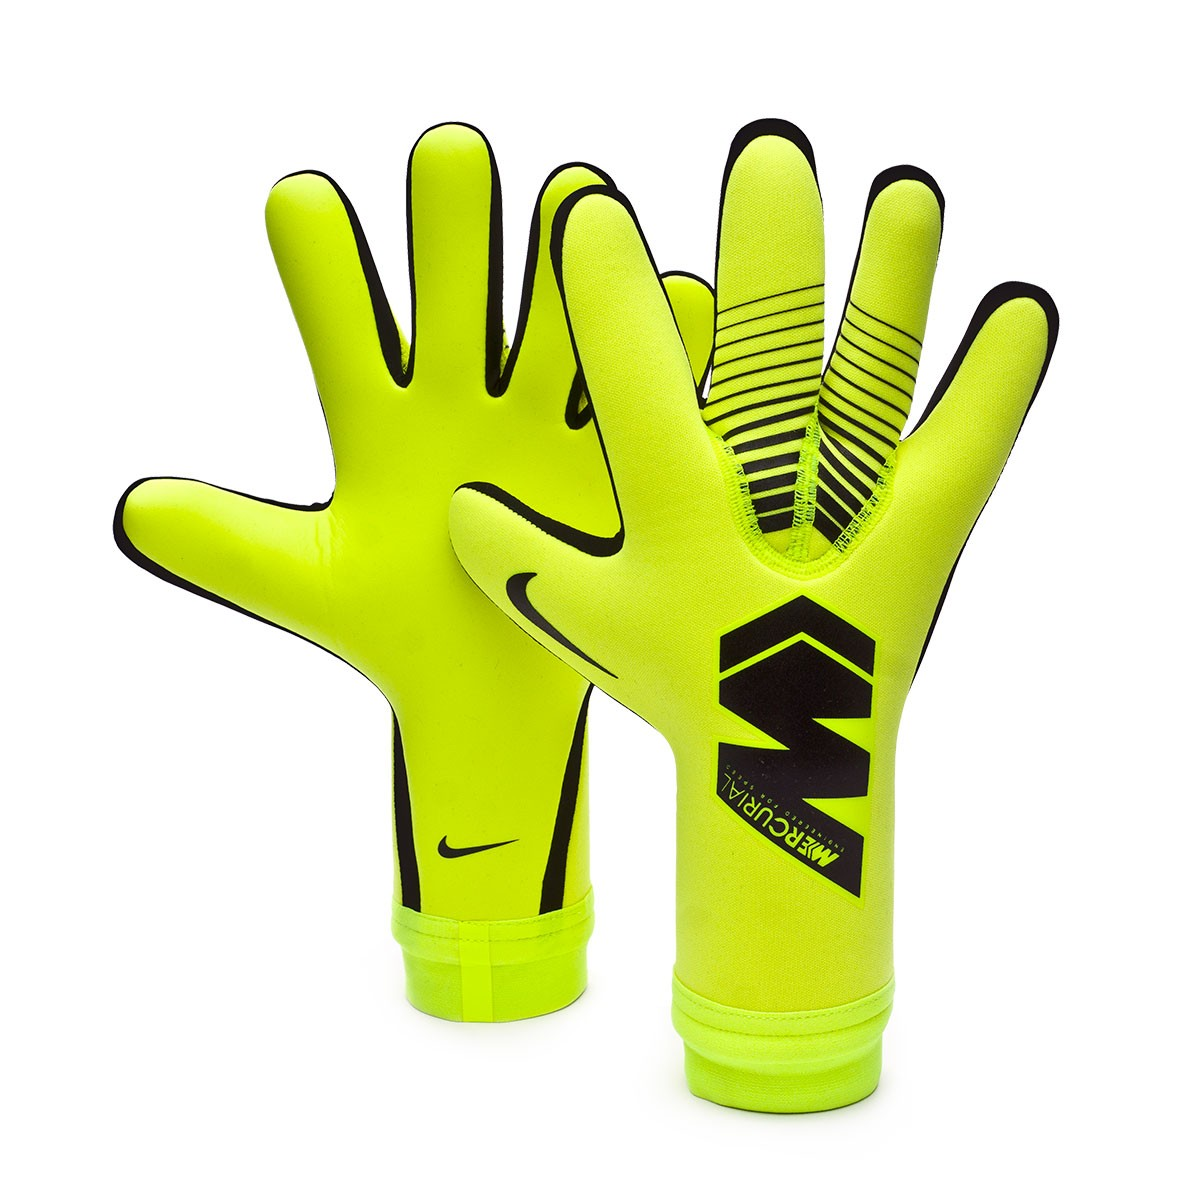 41490f05ba2b4 Glove Nike Mercurial Touch Victory Volt-Black - Football store ...